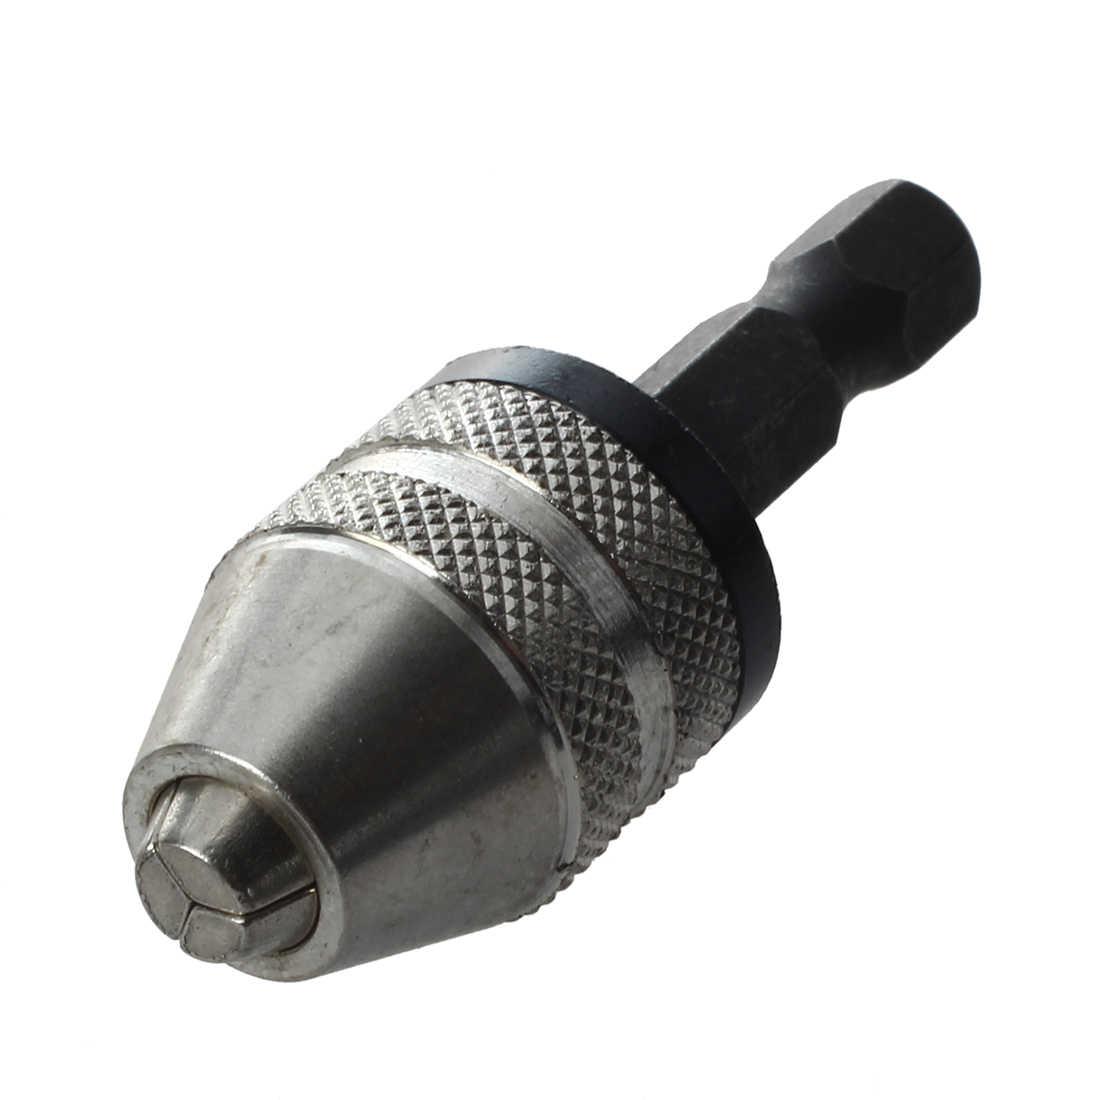 1pc 6.35mm Quick Change Keyless Drill Bit Chuck Hex Shank Adapter Converter Tool